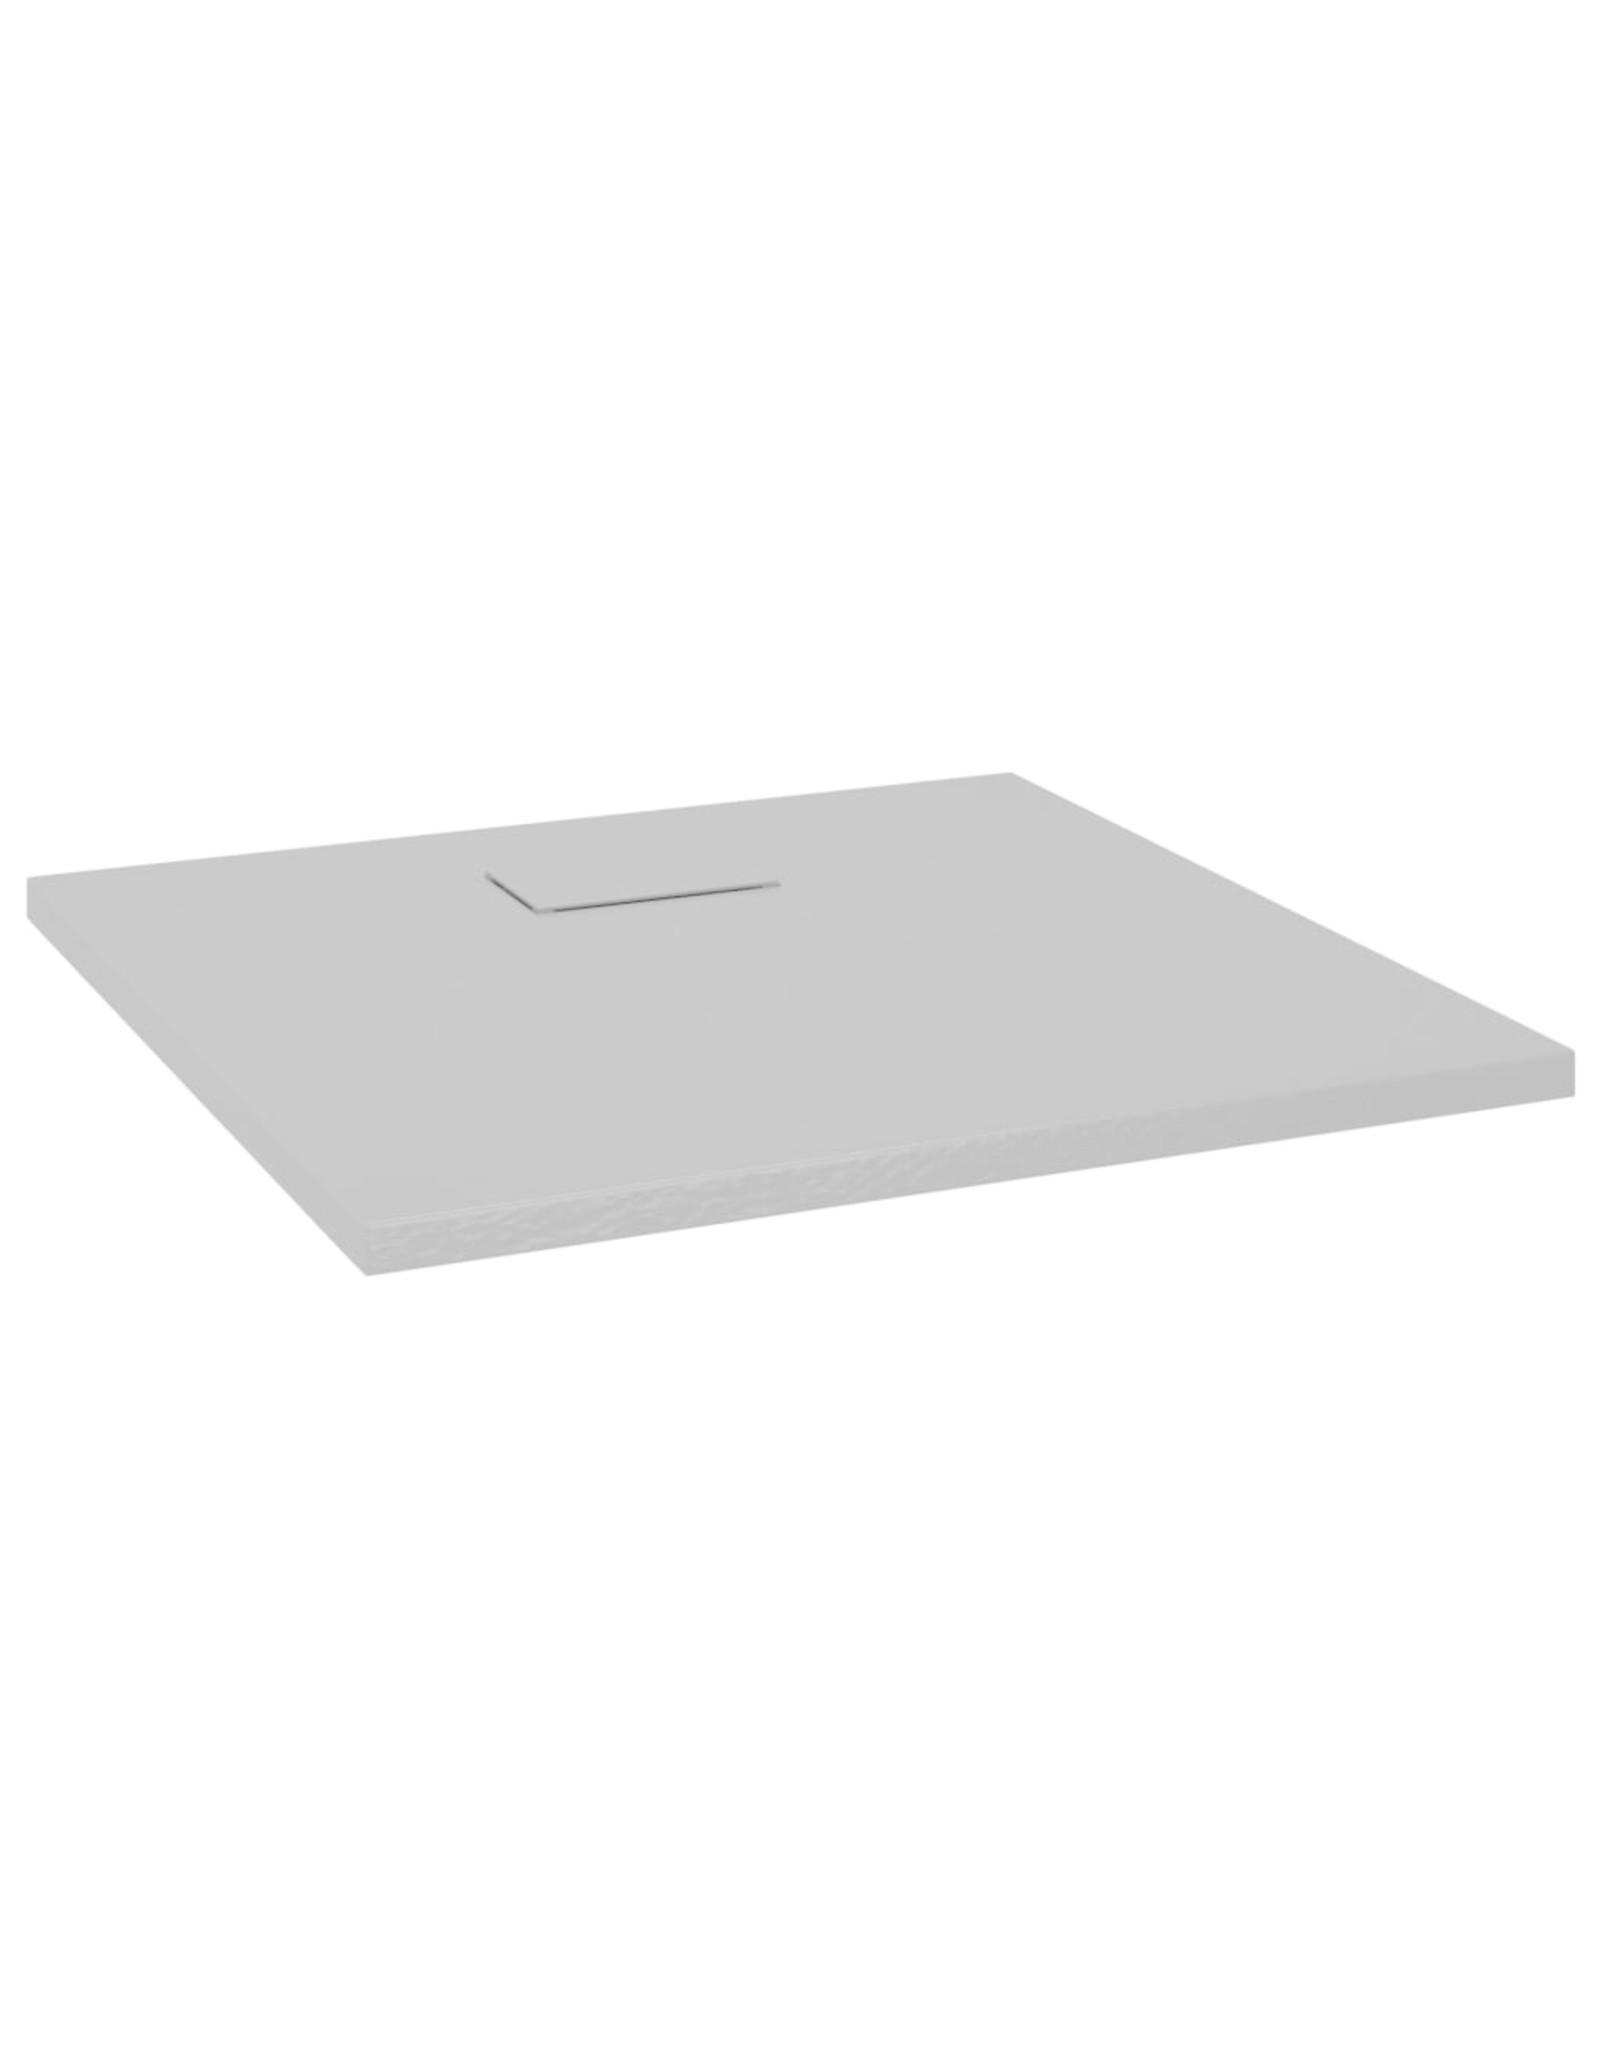 Douchebak 80x80 cm SMC grijs